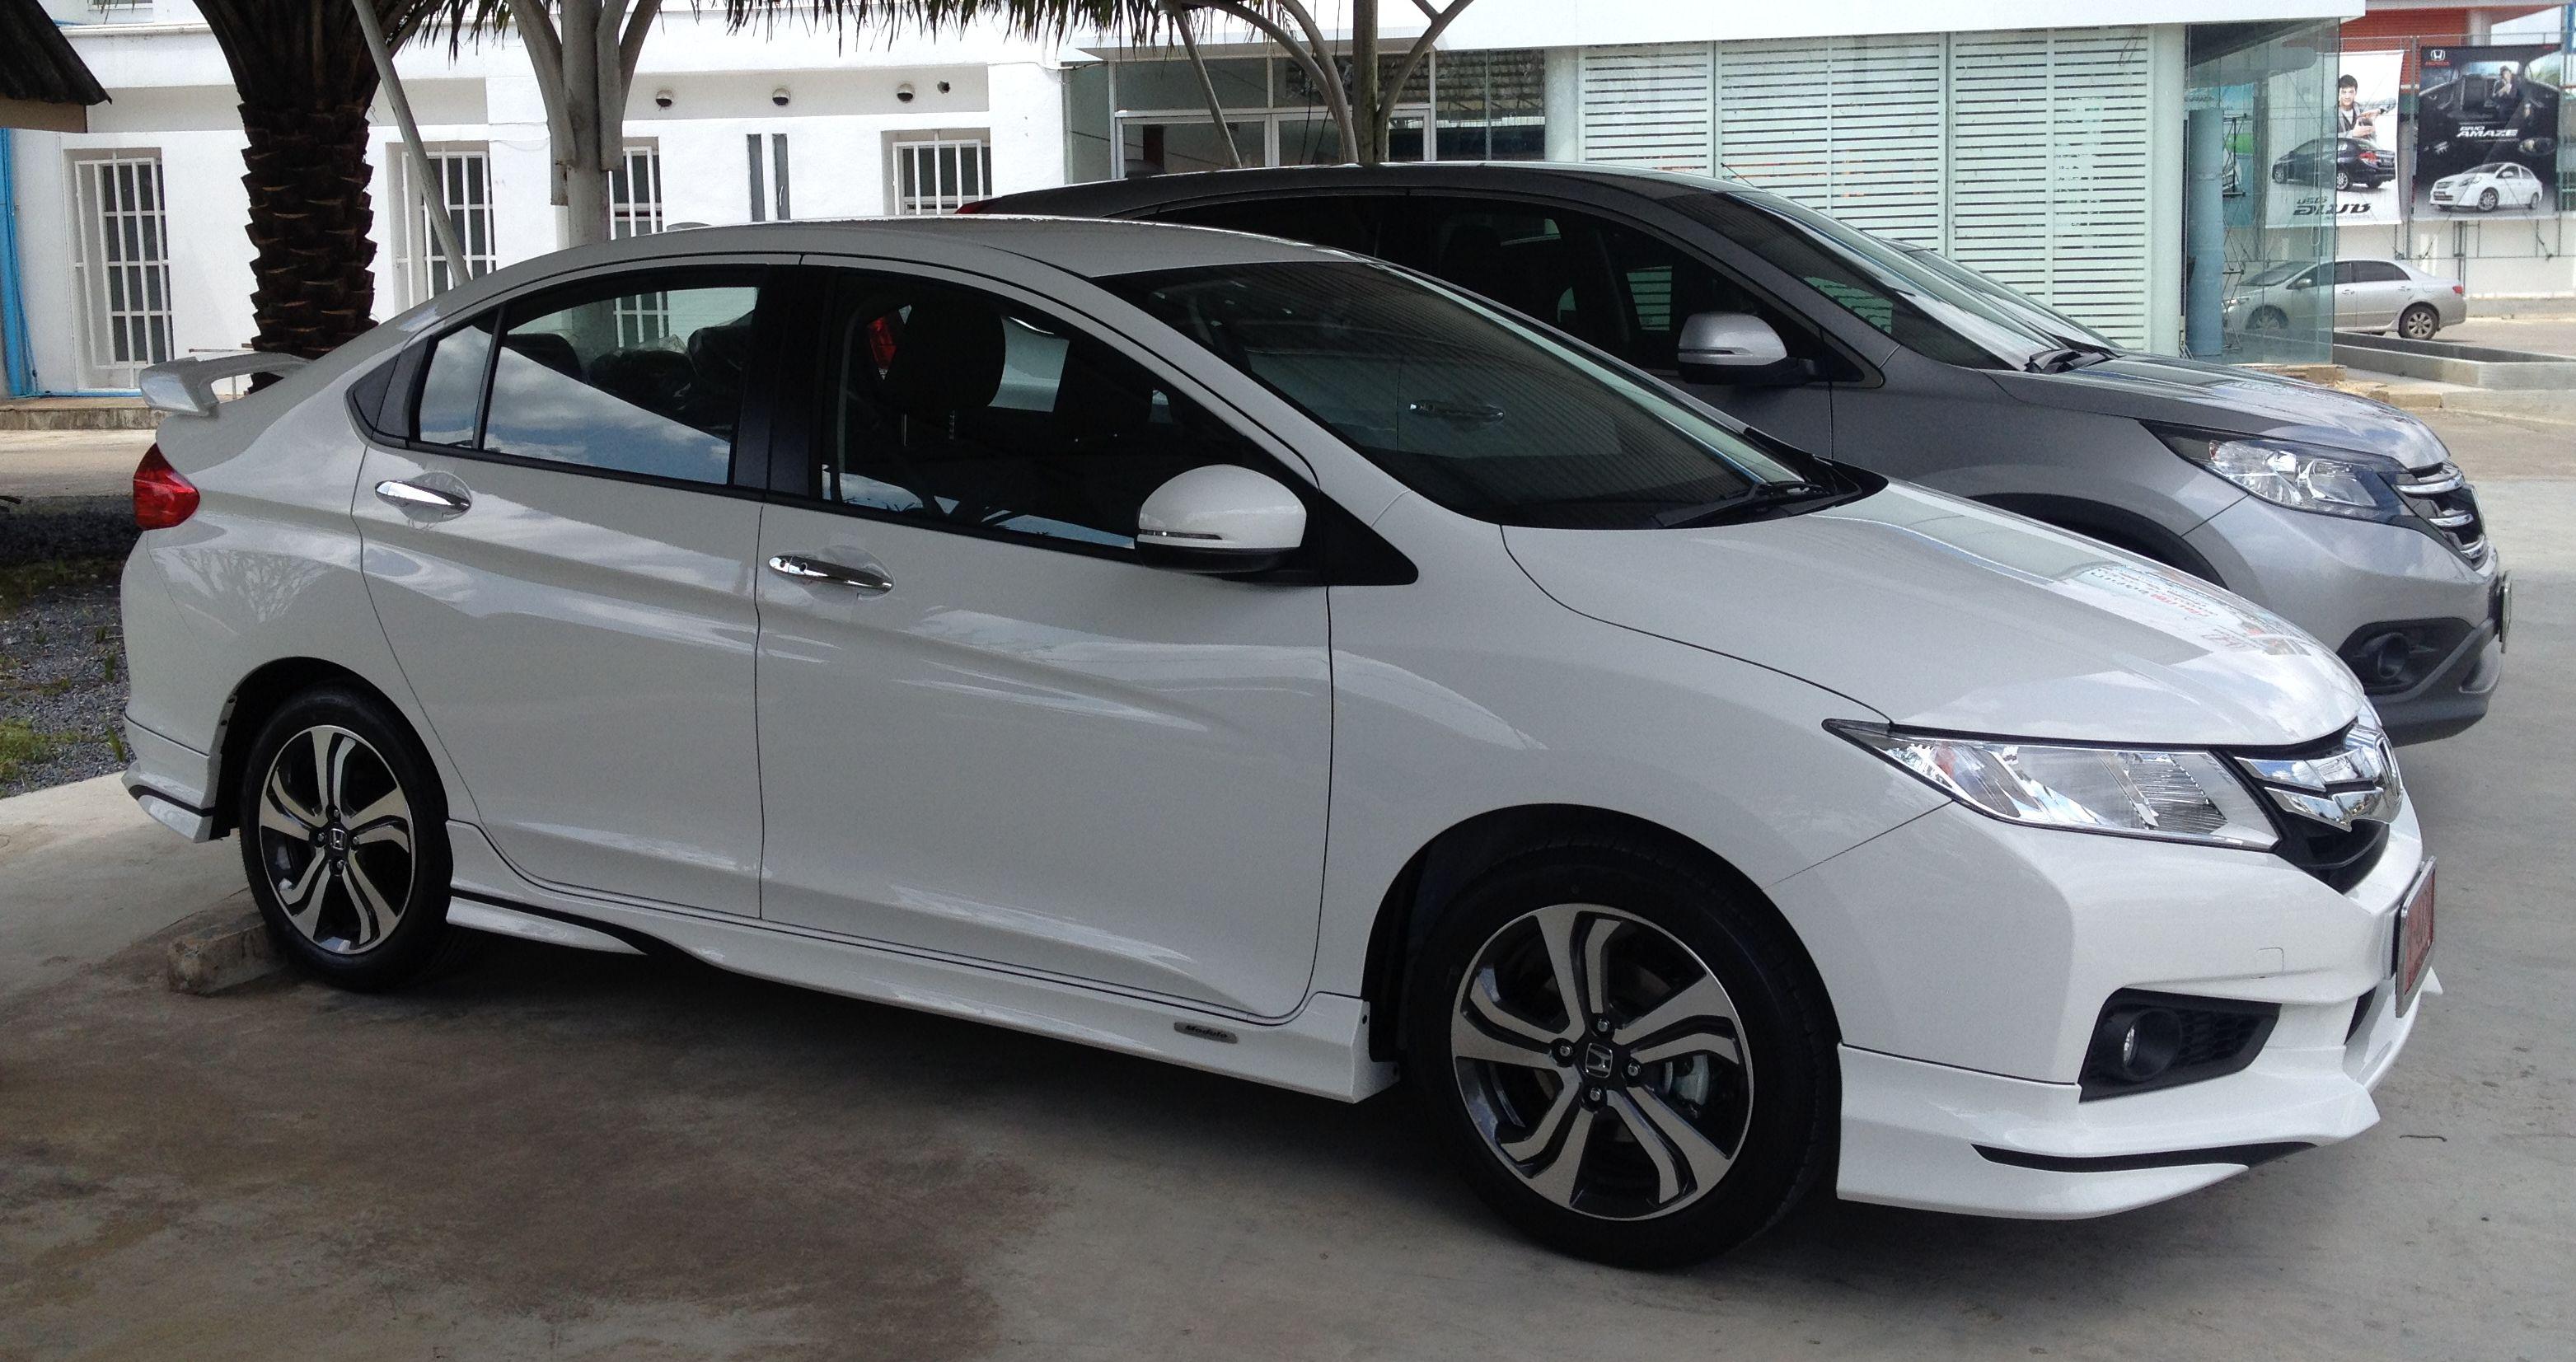 Honda City 2014 Modulo เน้นรูป ถ้าซ้ำซากขออภัยครับ Pantip